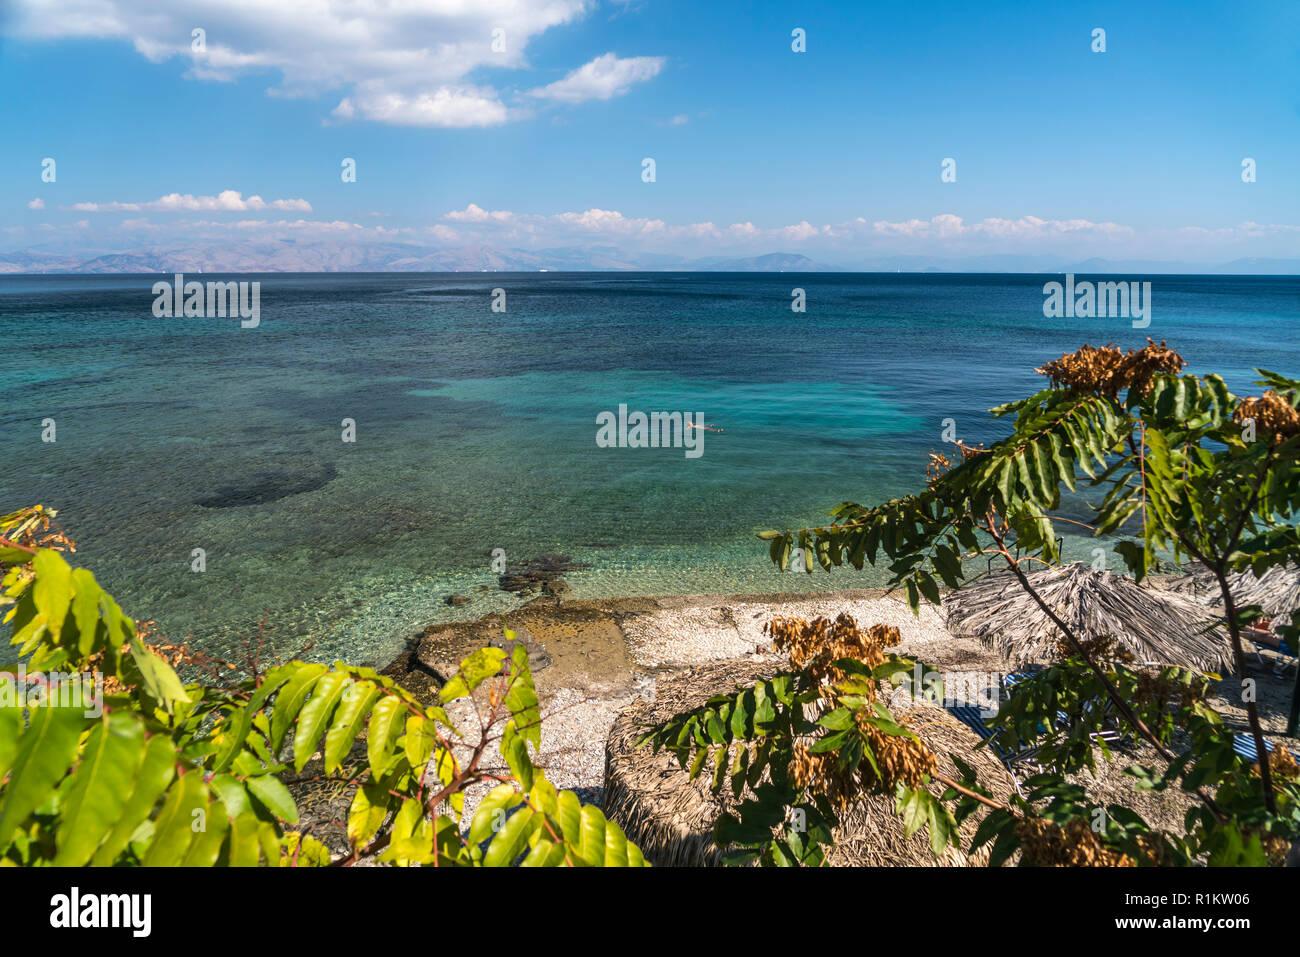 Küste bei Benitses, Insel Korfu, Griechenland  Europa | coast near Benitses, Corfu island, Greece, Europe - Stock Image